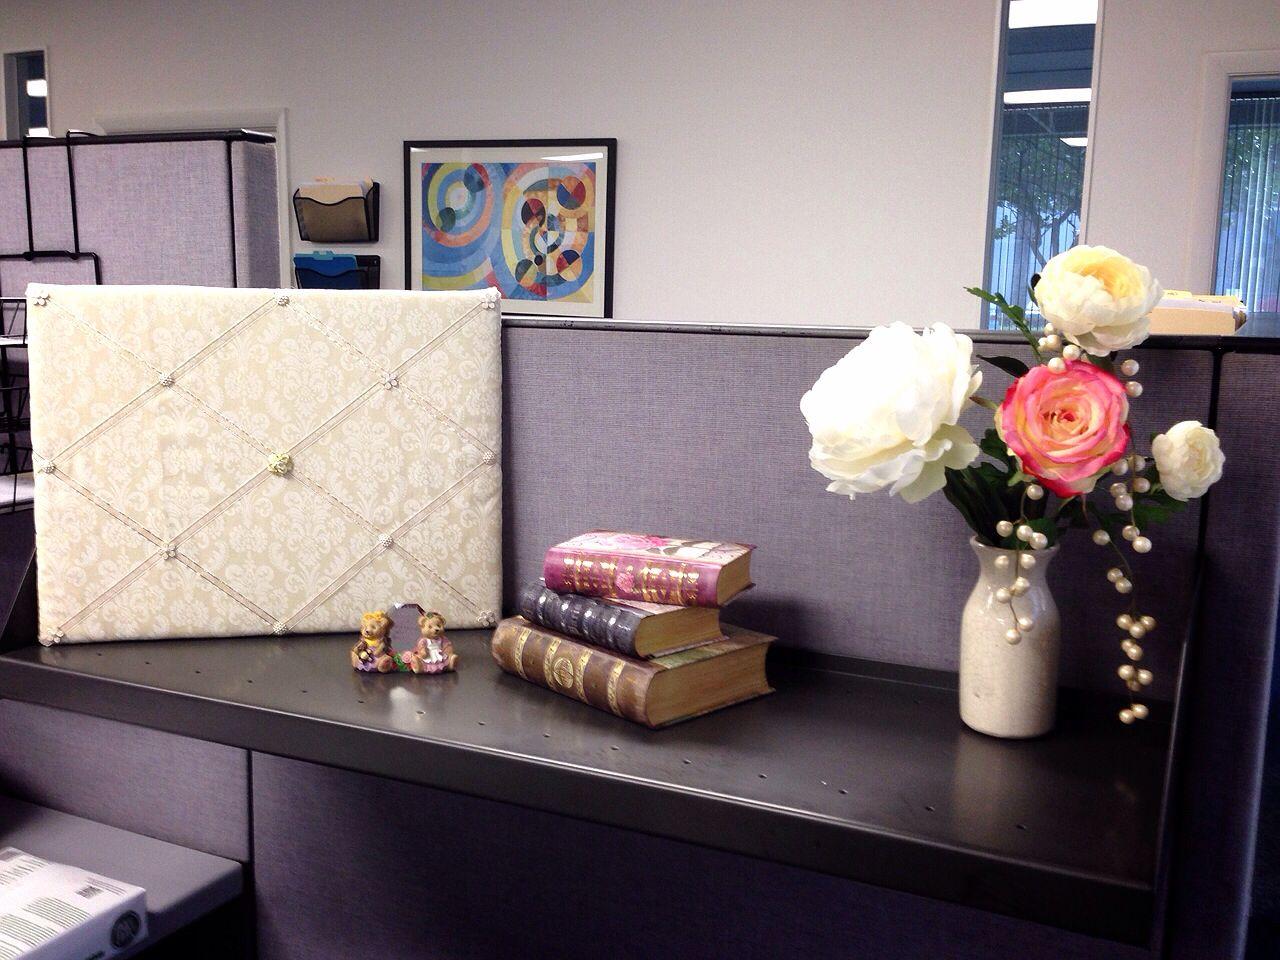 Hott cubicle decor Cubicle decor office, Work space